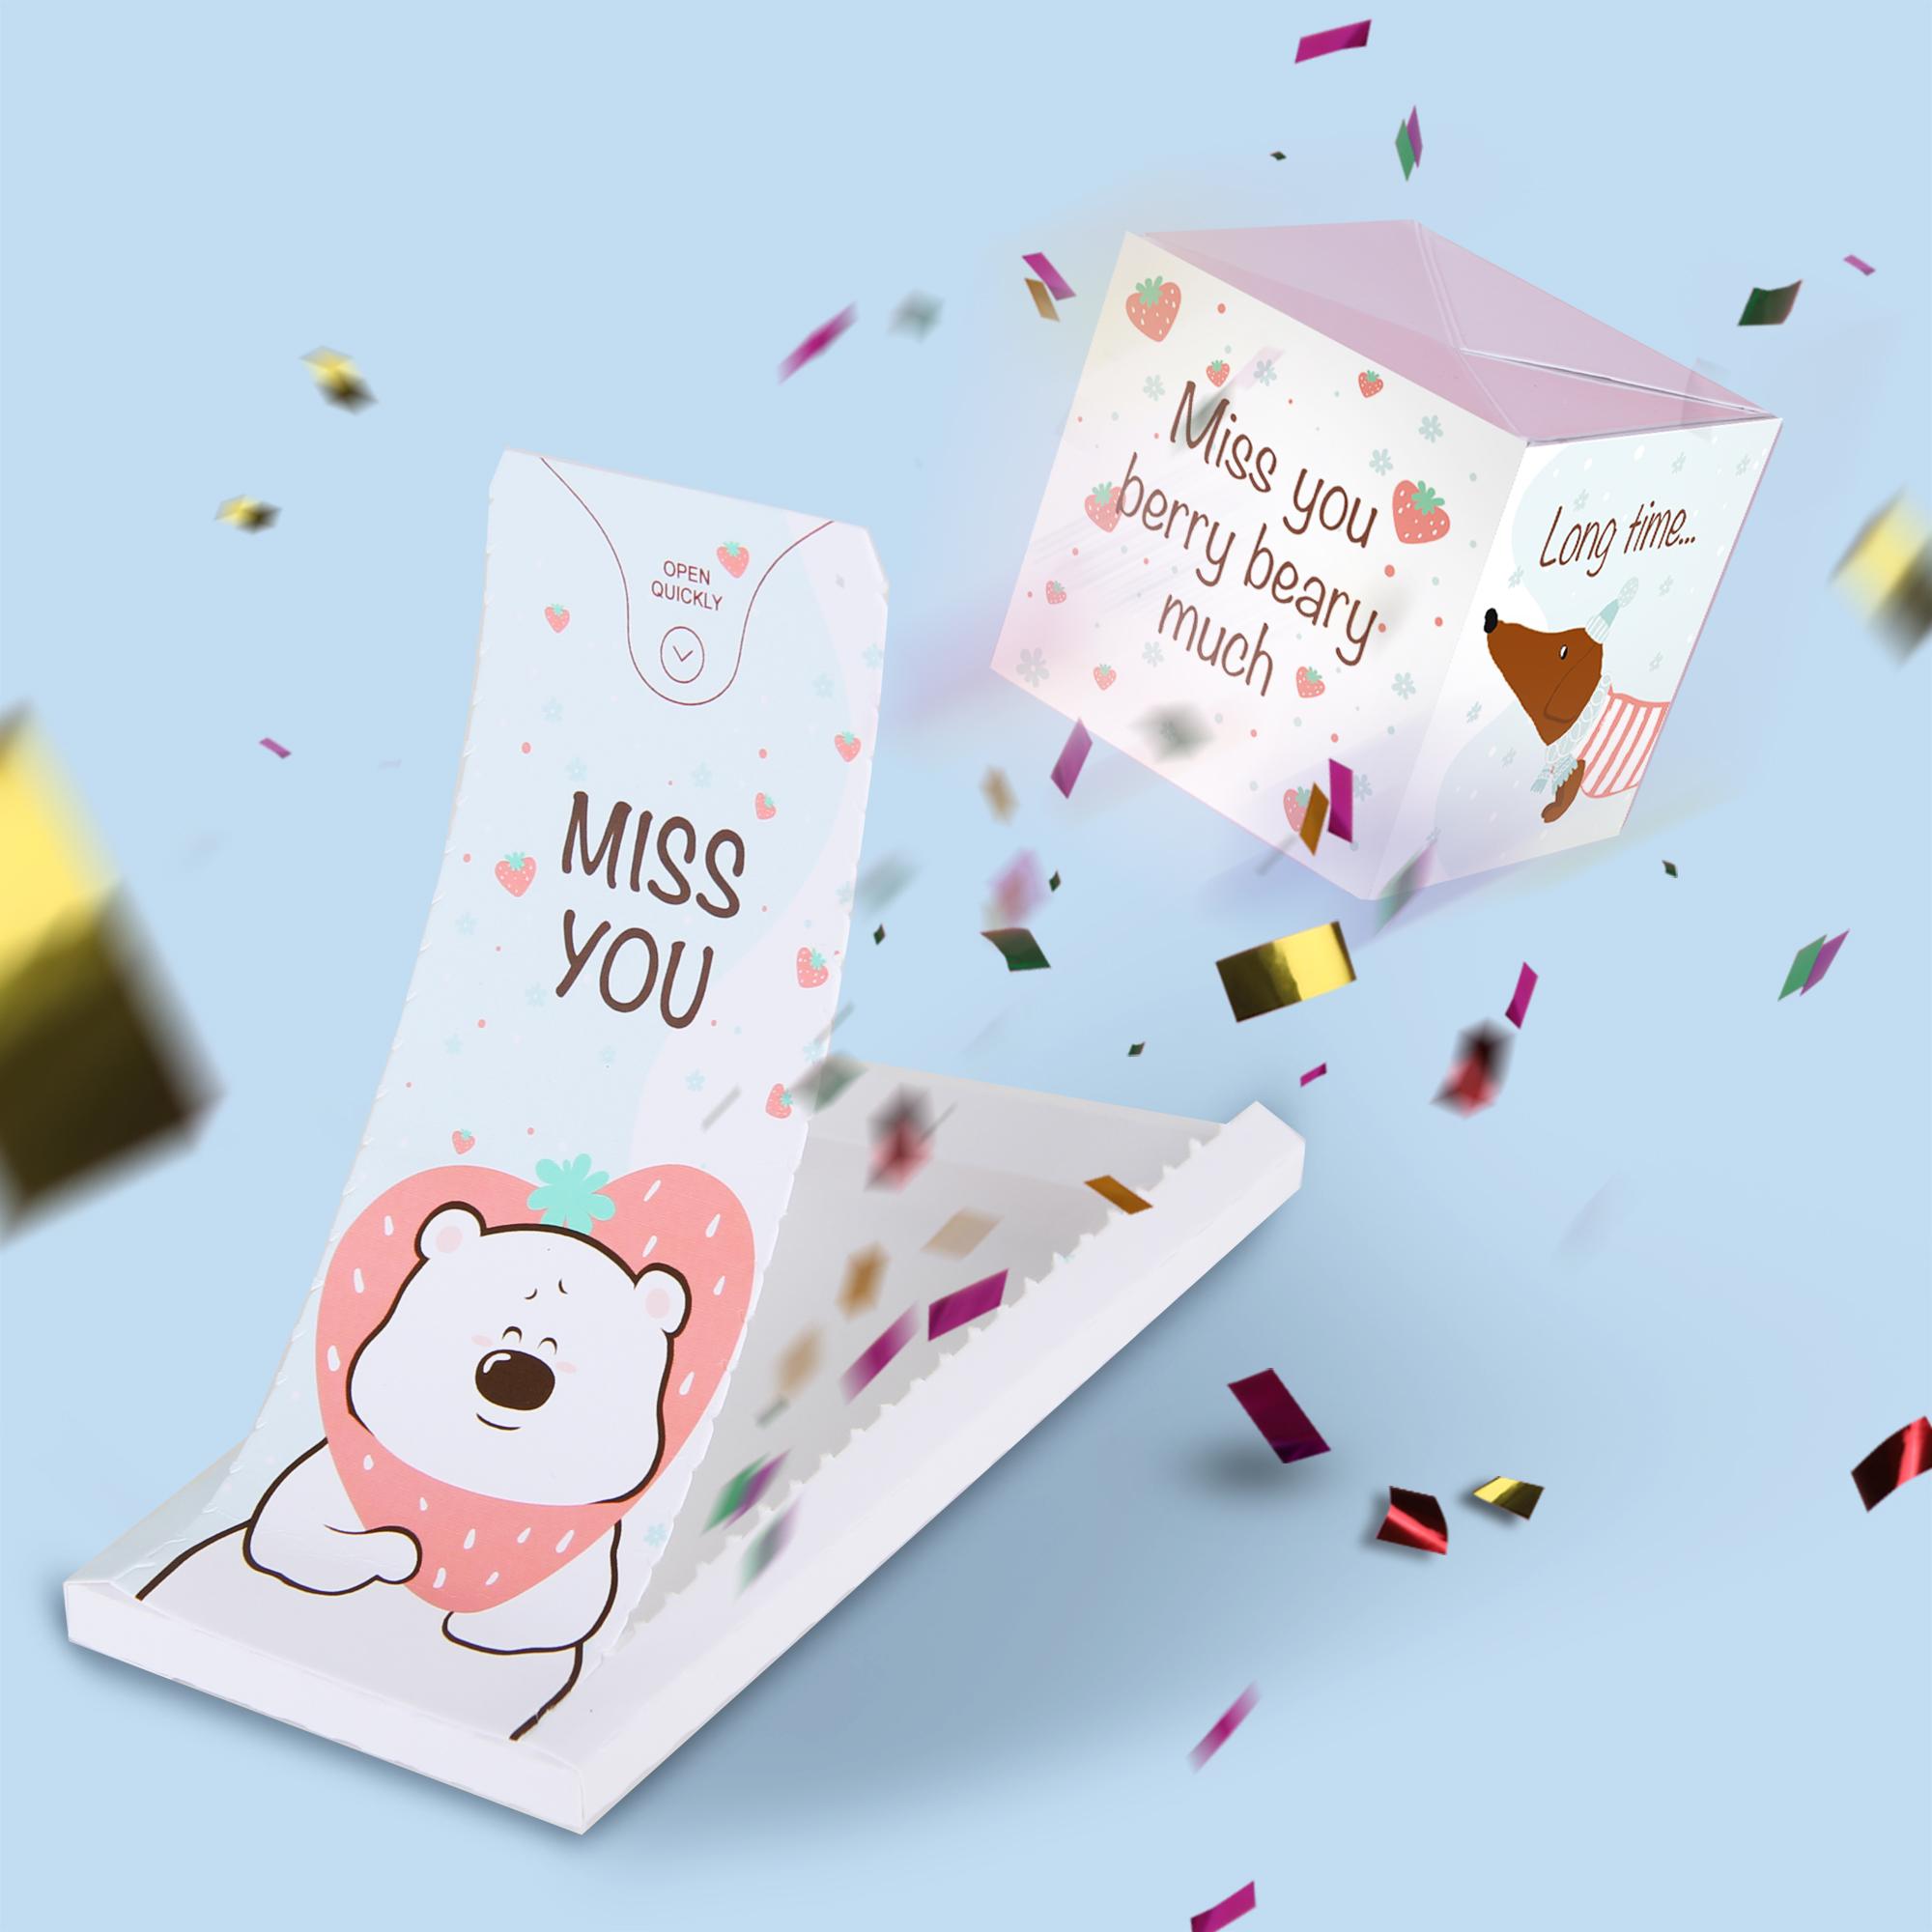 Boom card - Miss you